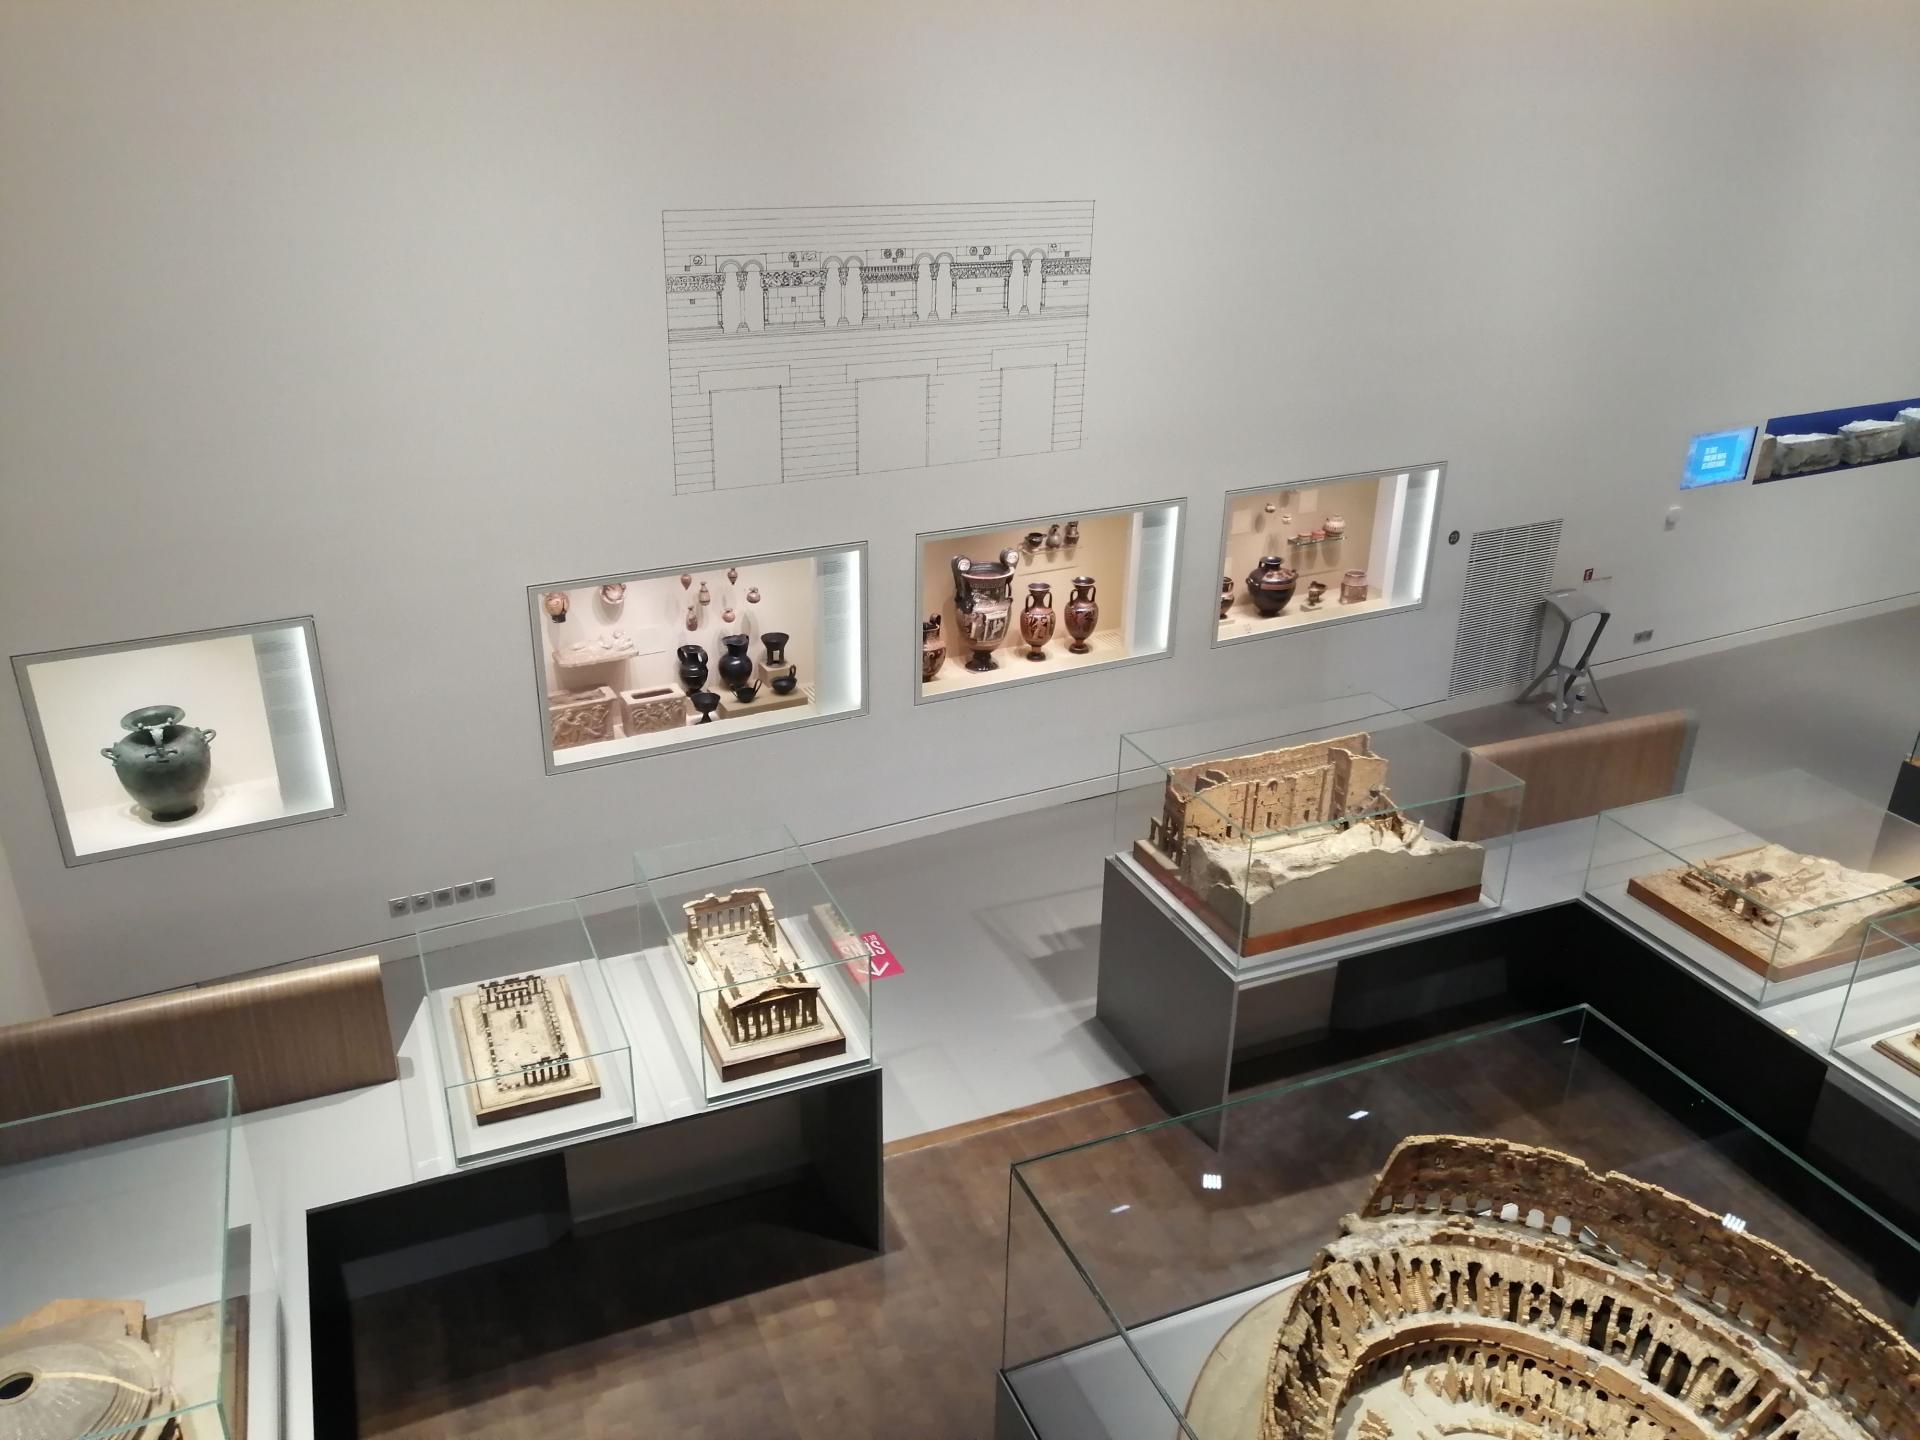 Musee de la romanite 18